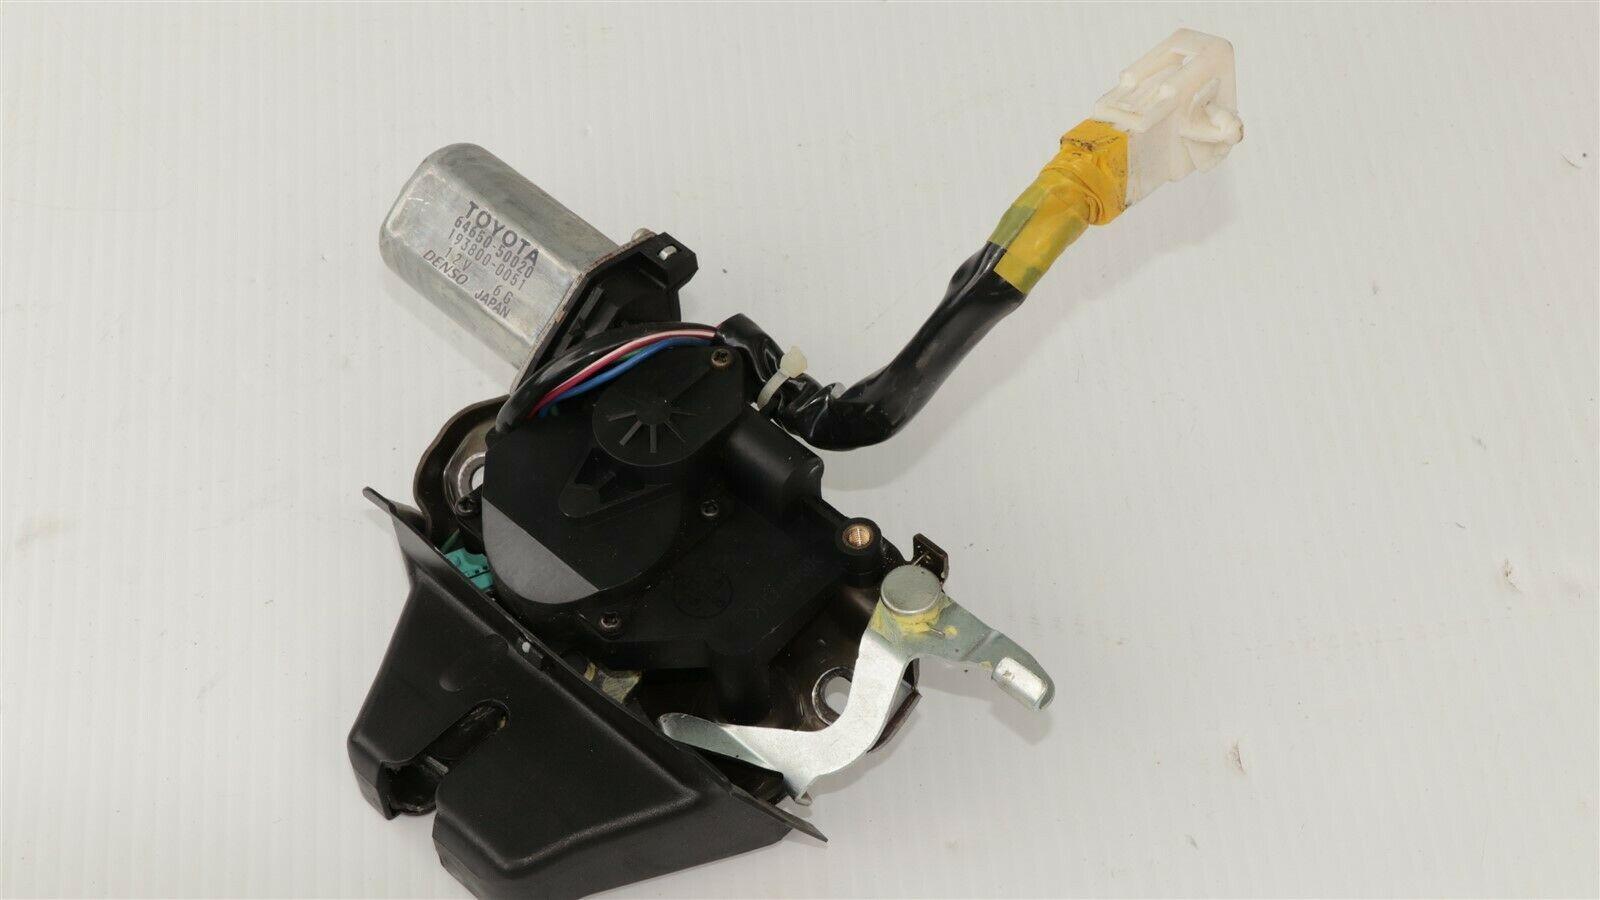 01-06 Lexus Ls430 Trunk Lid Latch Lock Actuator W Motor